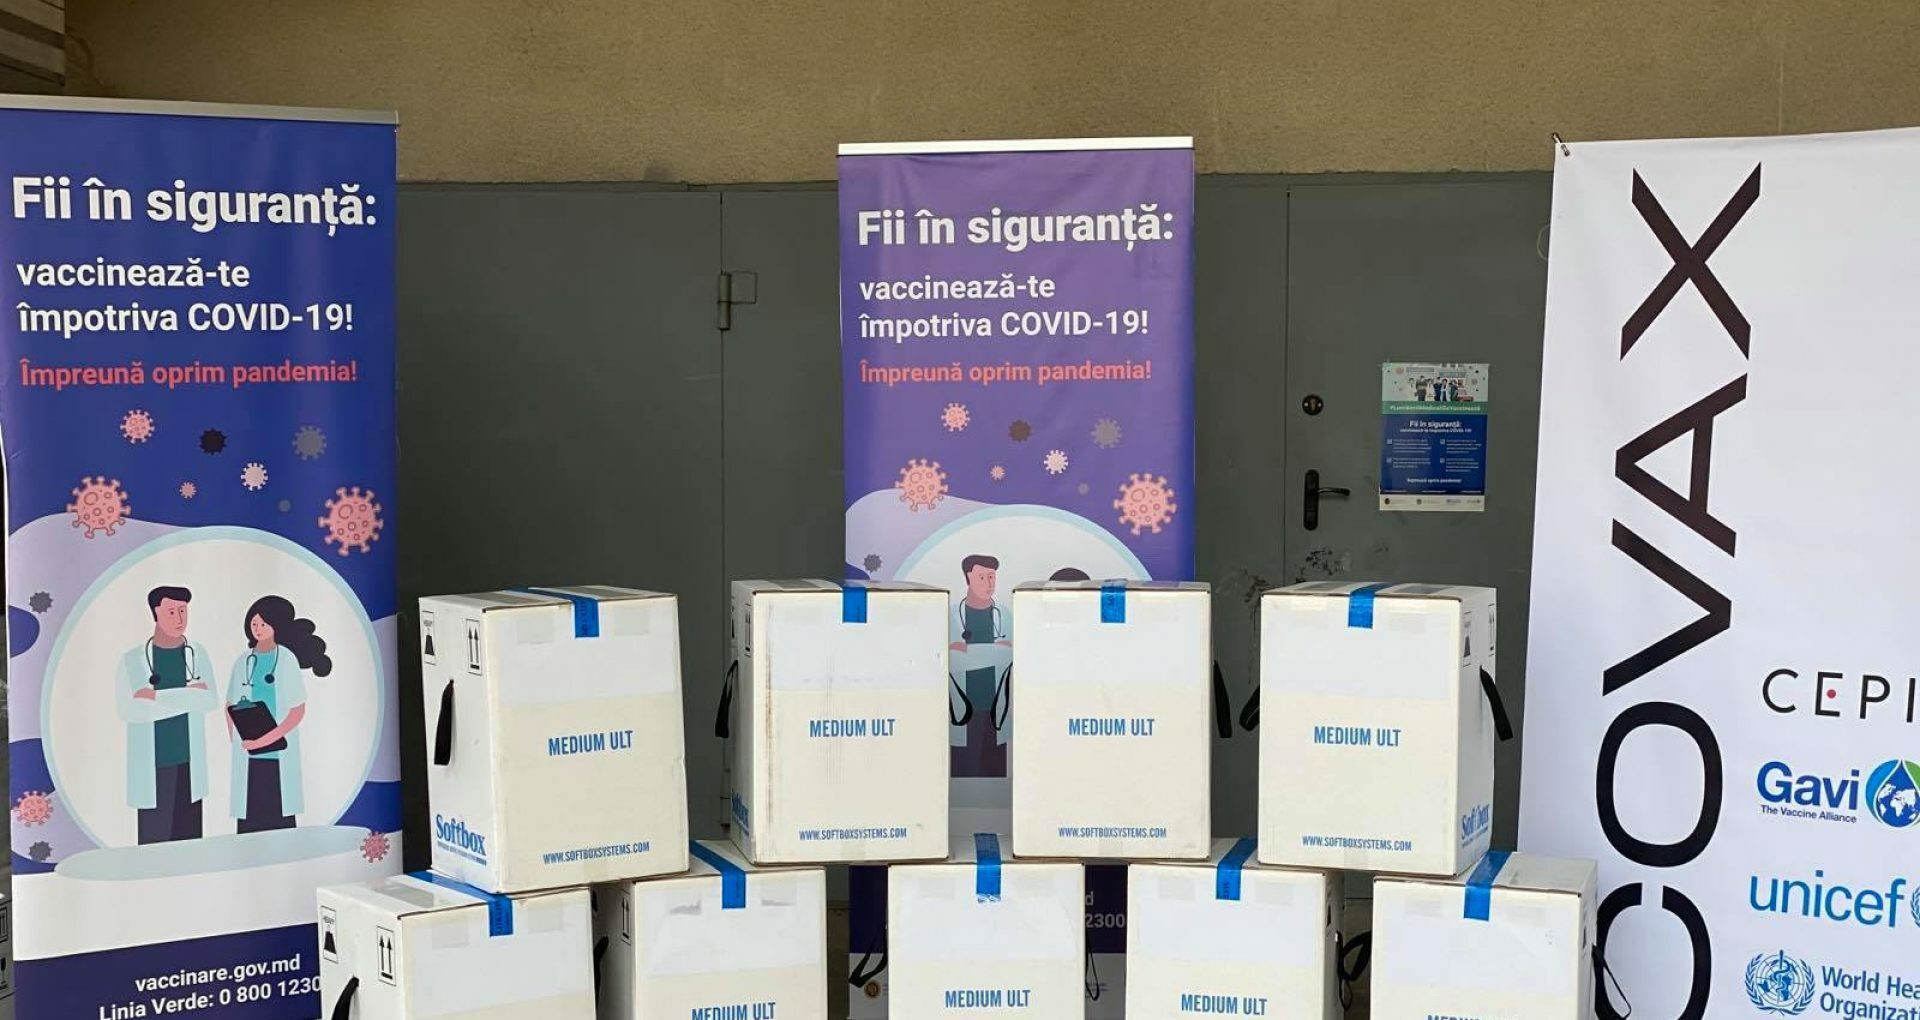 Moldova Received 100,620 Pfizer / BioNTech Vaccines through COVAX